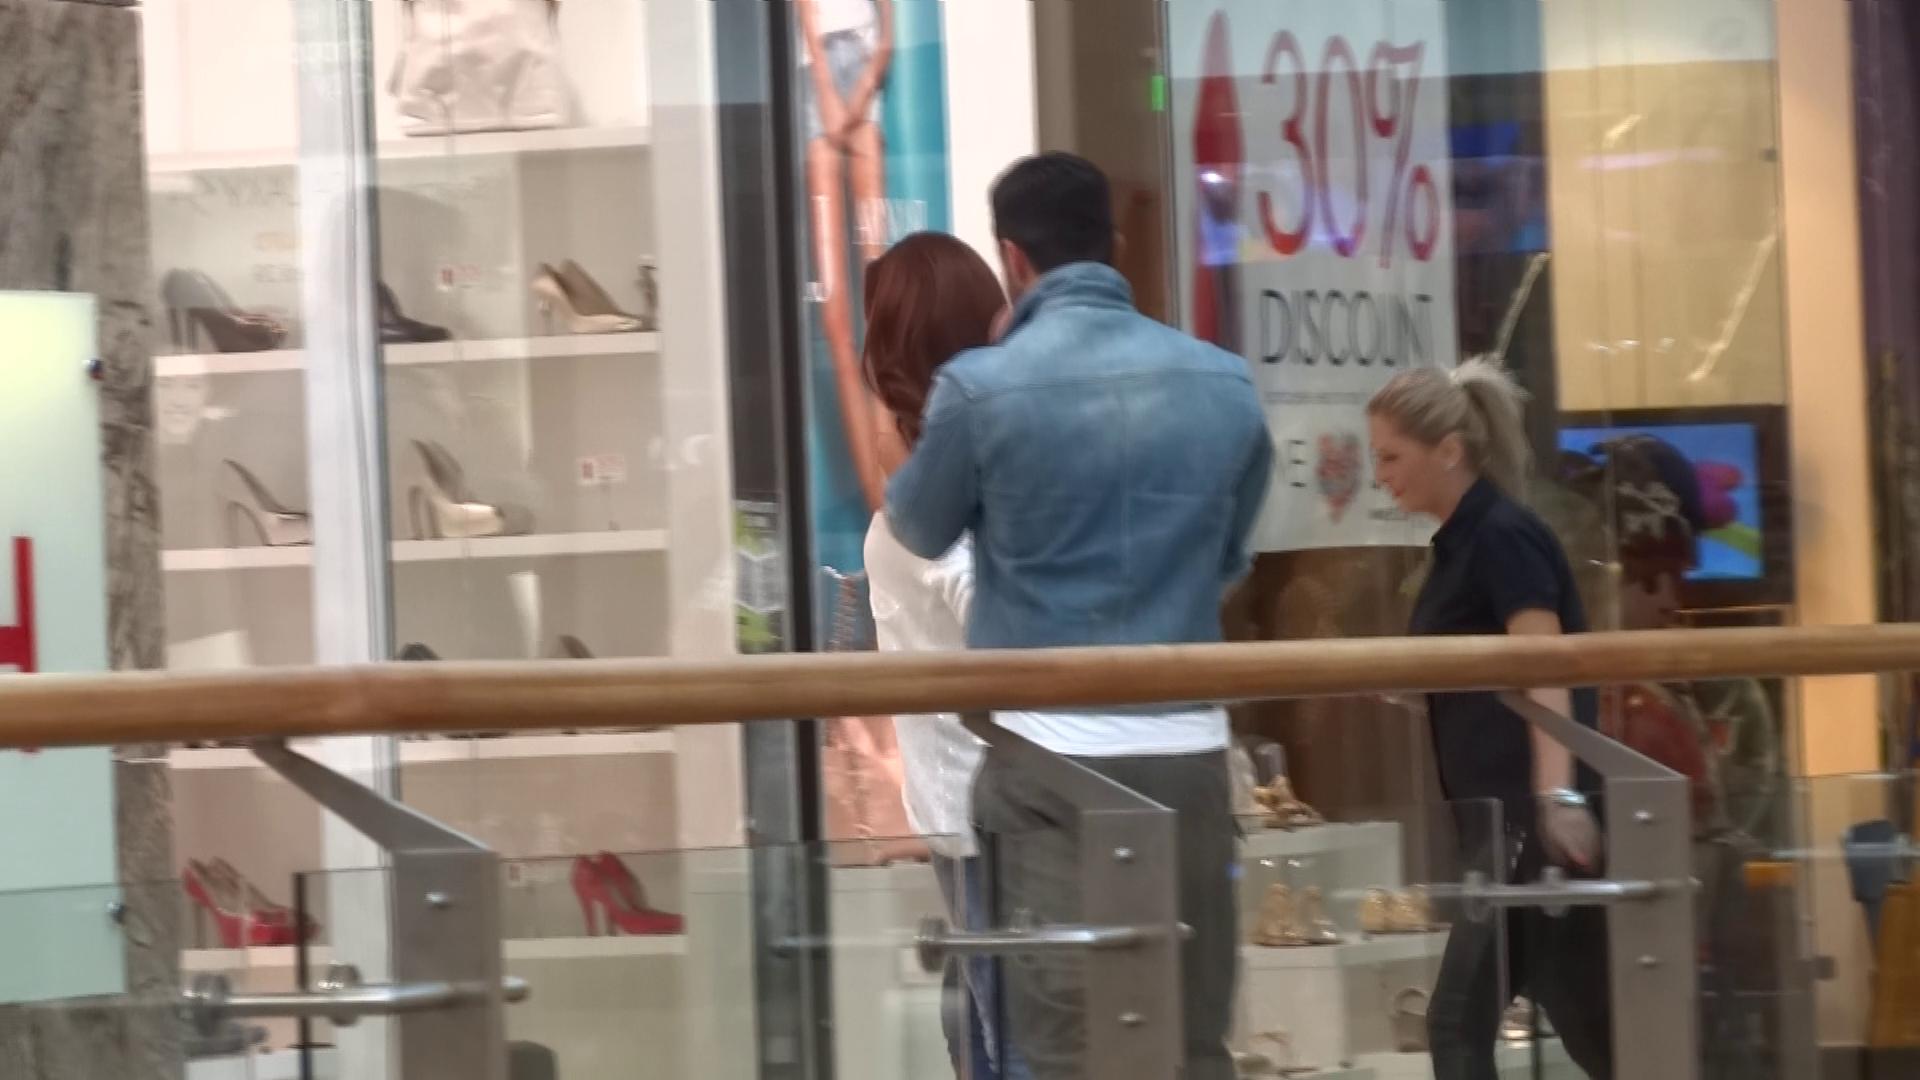 Bianca si Victor intra de mana intr-un magazin cu incaltaminte